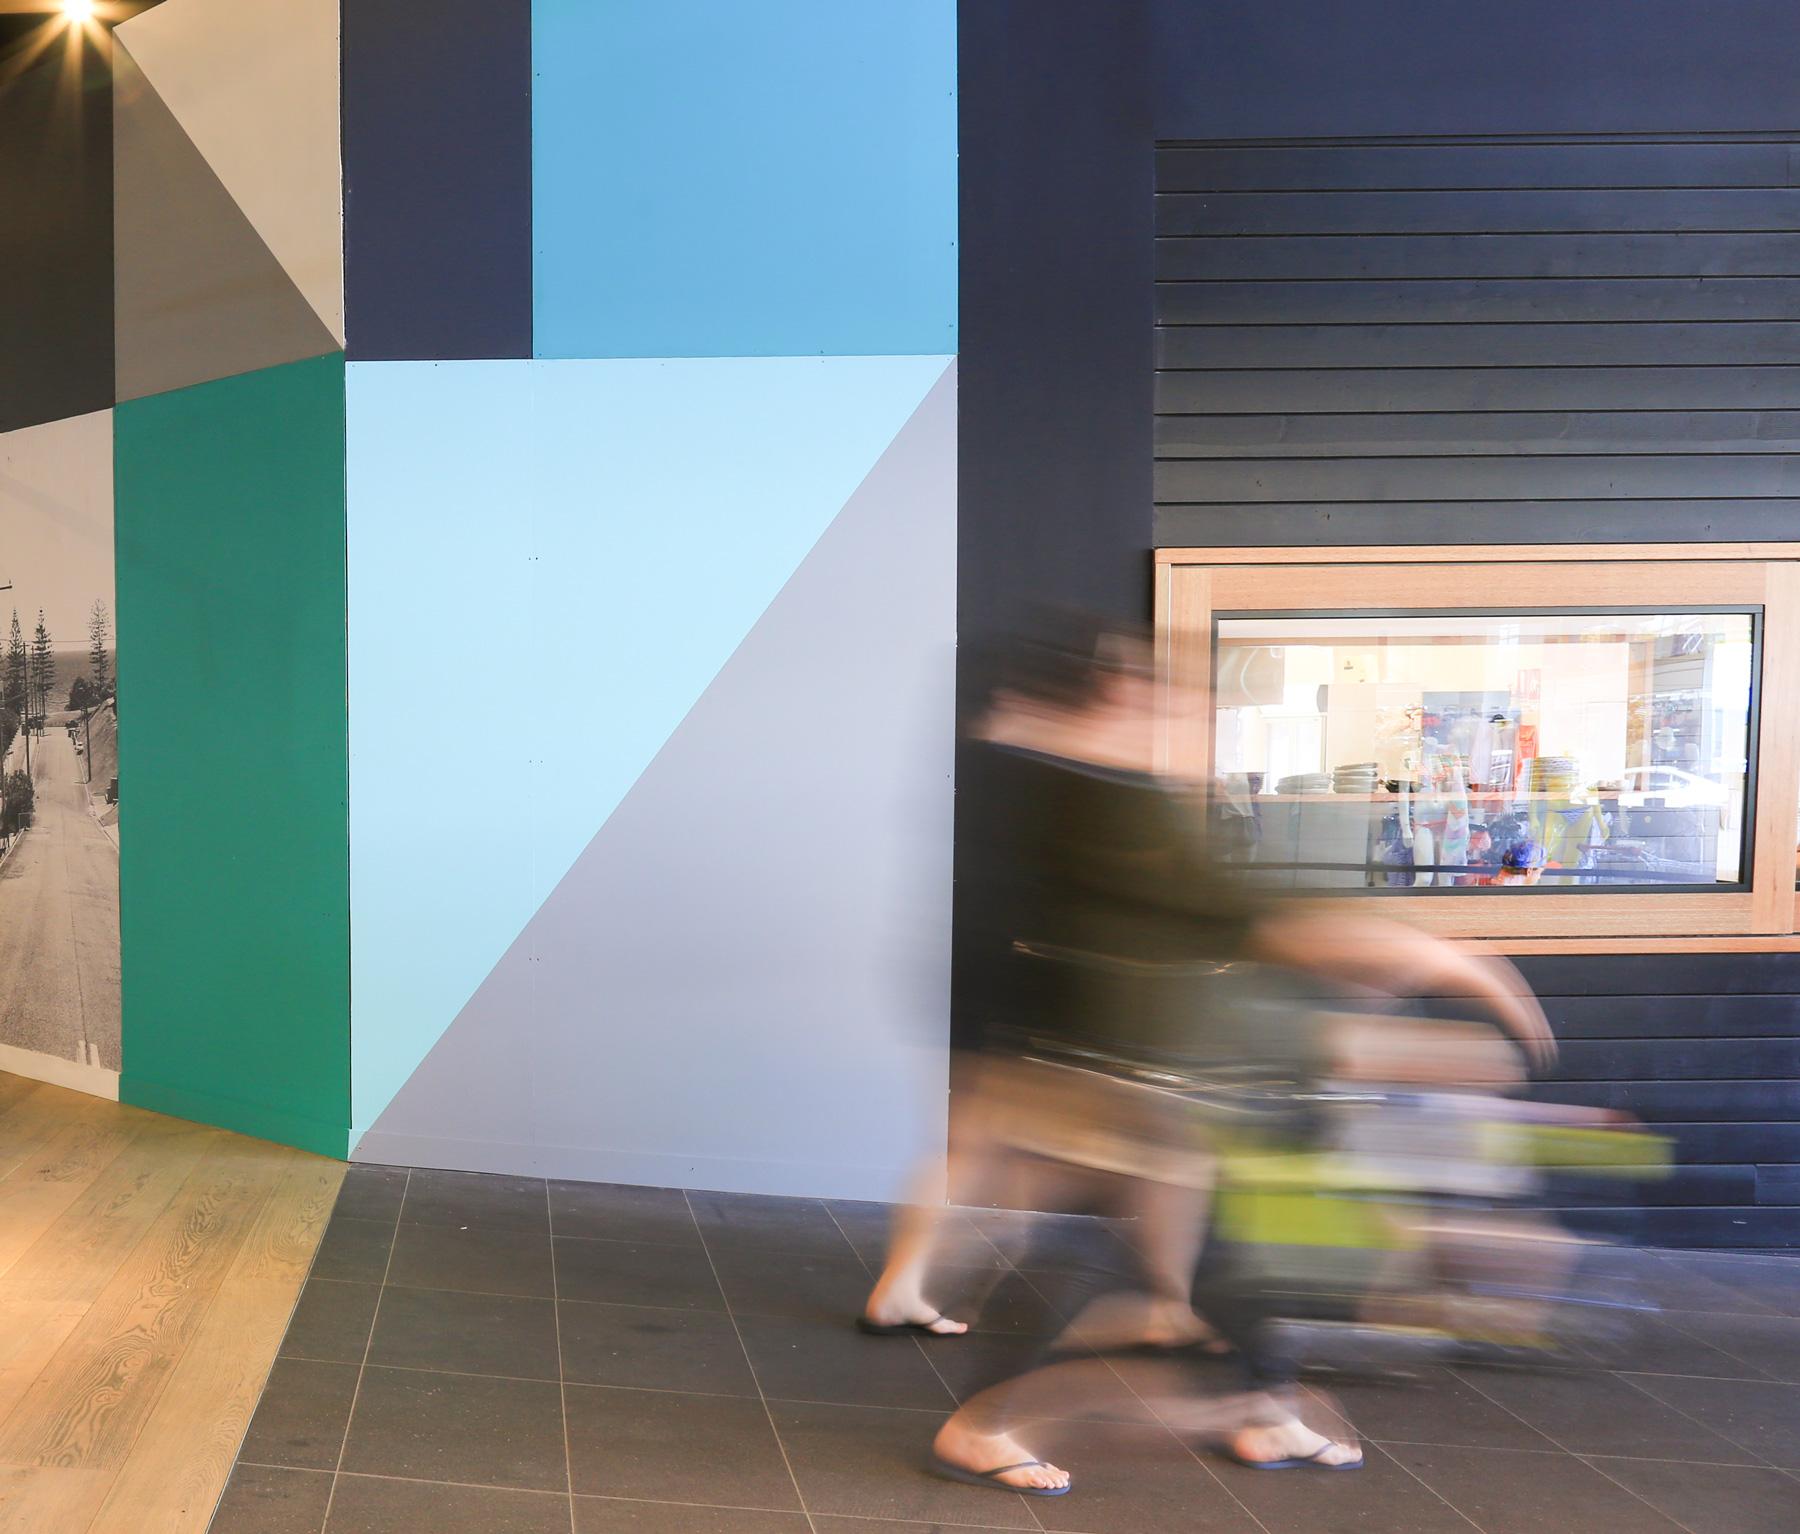 artwork-agency-mural-art-placemaking-the-strand-public-art2.jpg